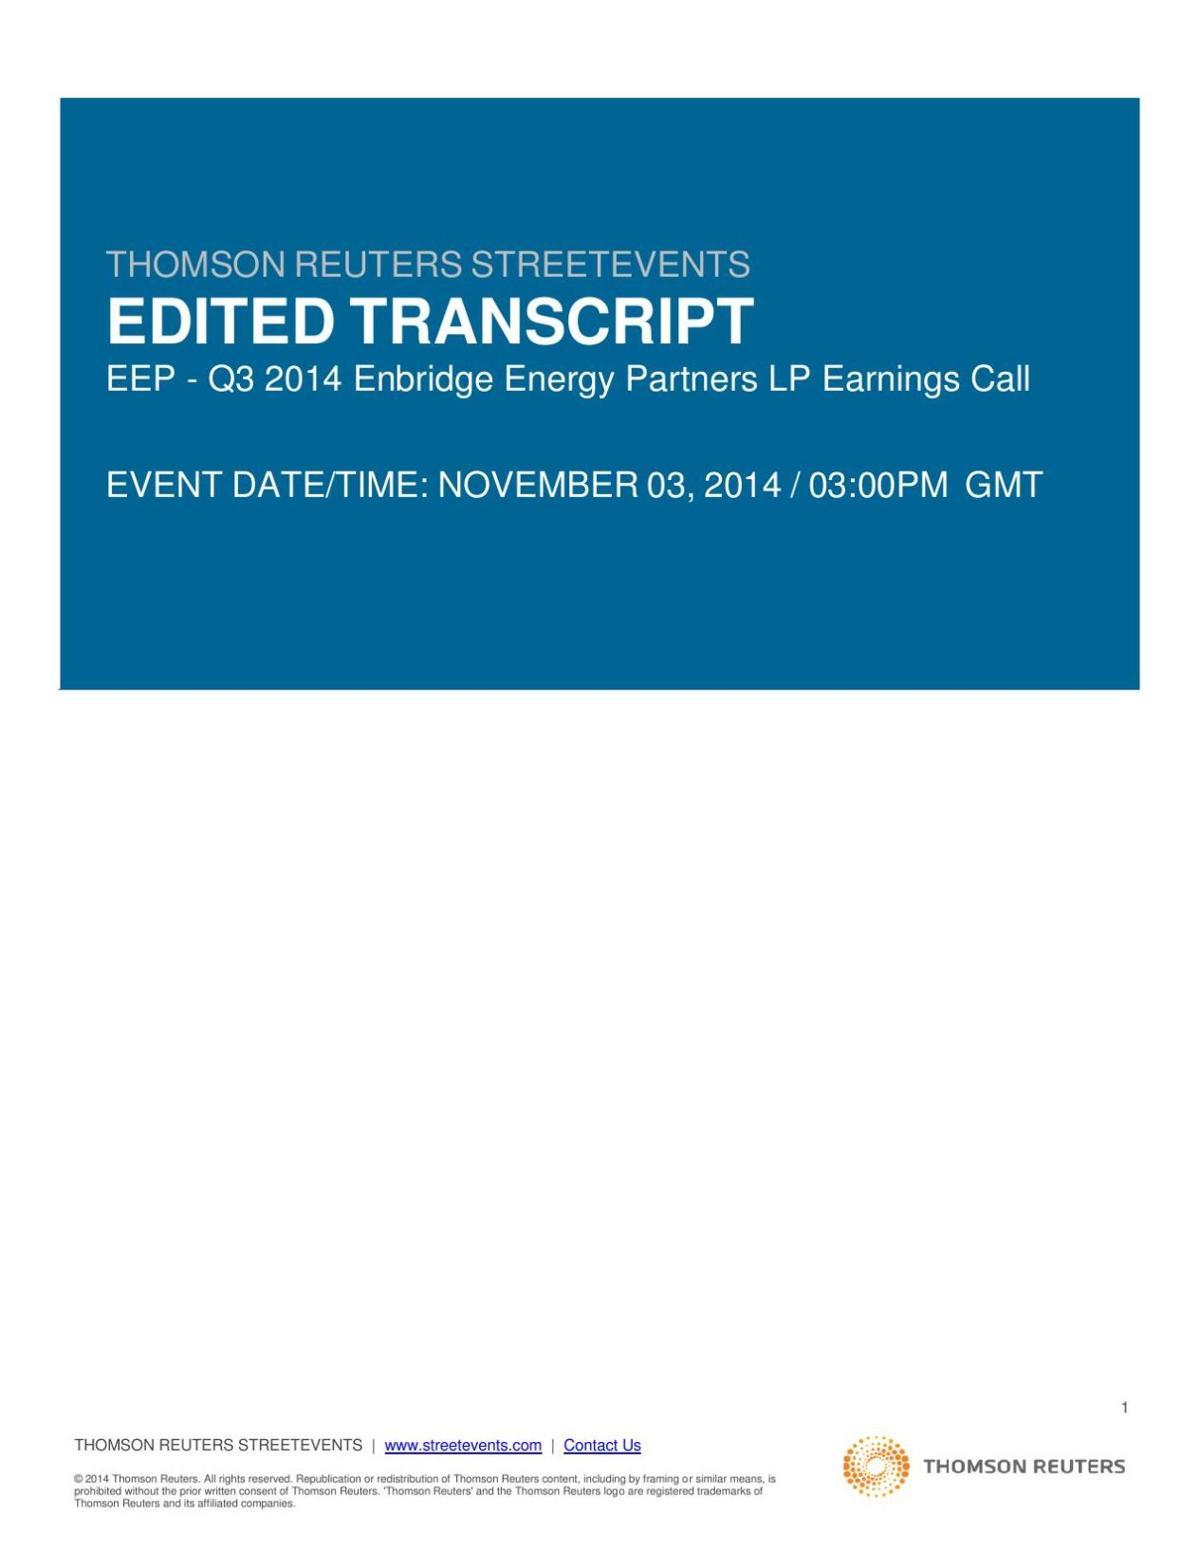 11/3/14 Enbridge earnings call (page 15 on spill insurance)